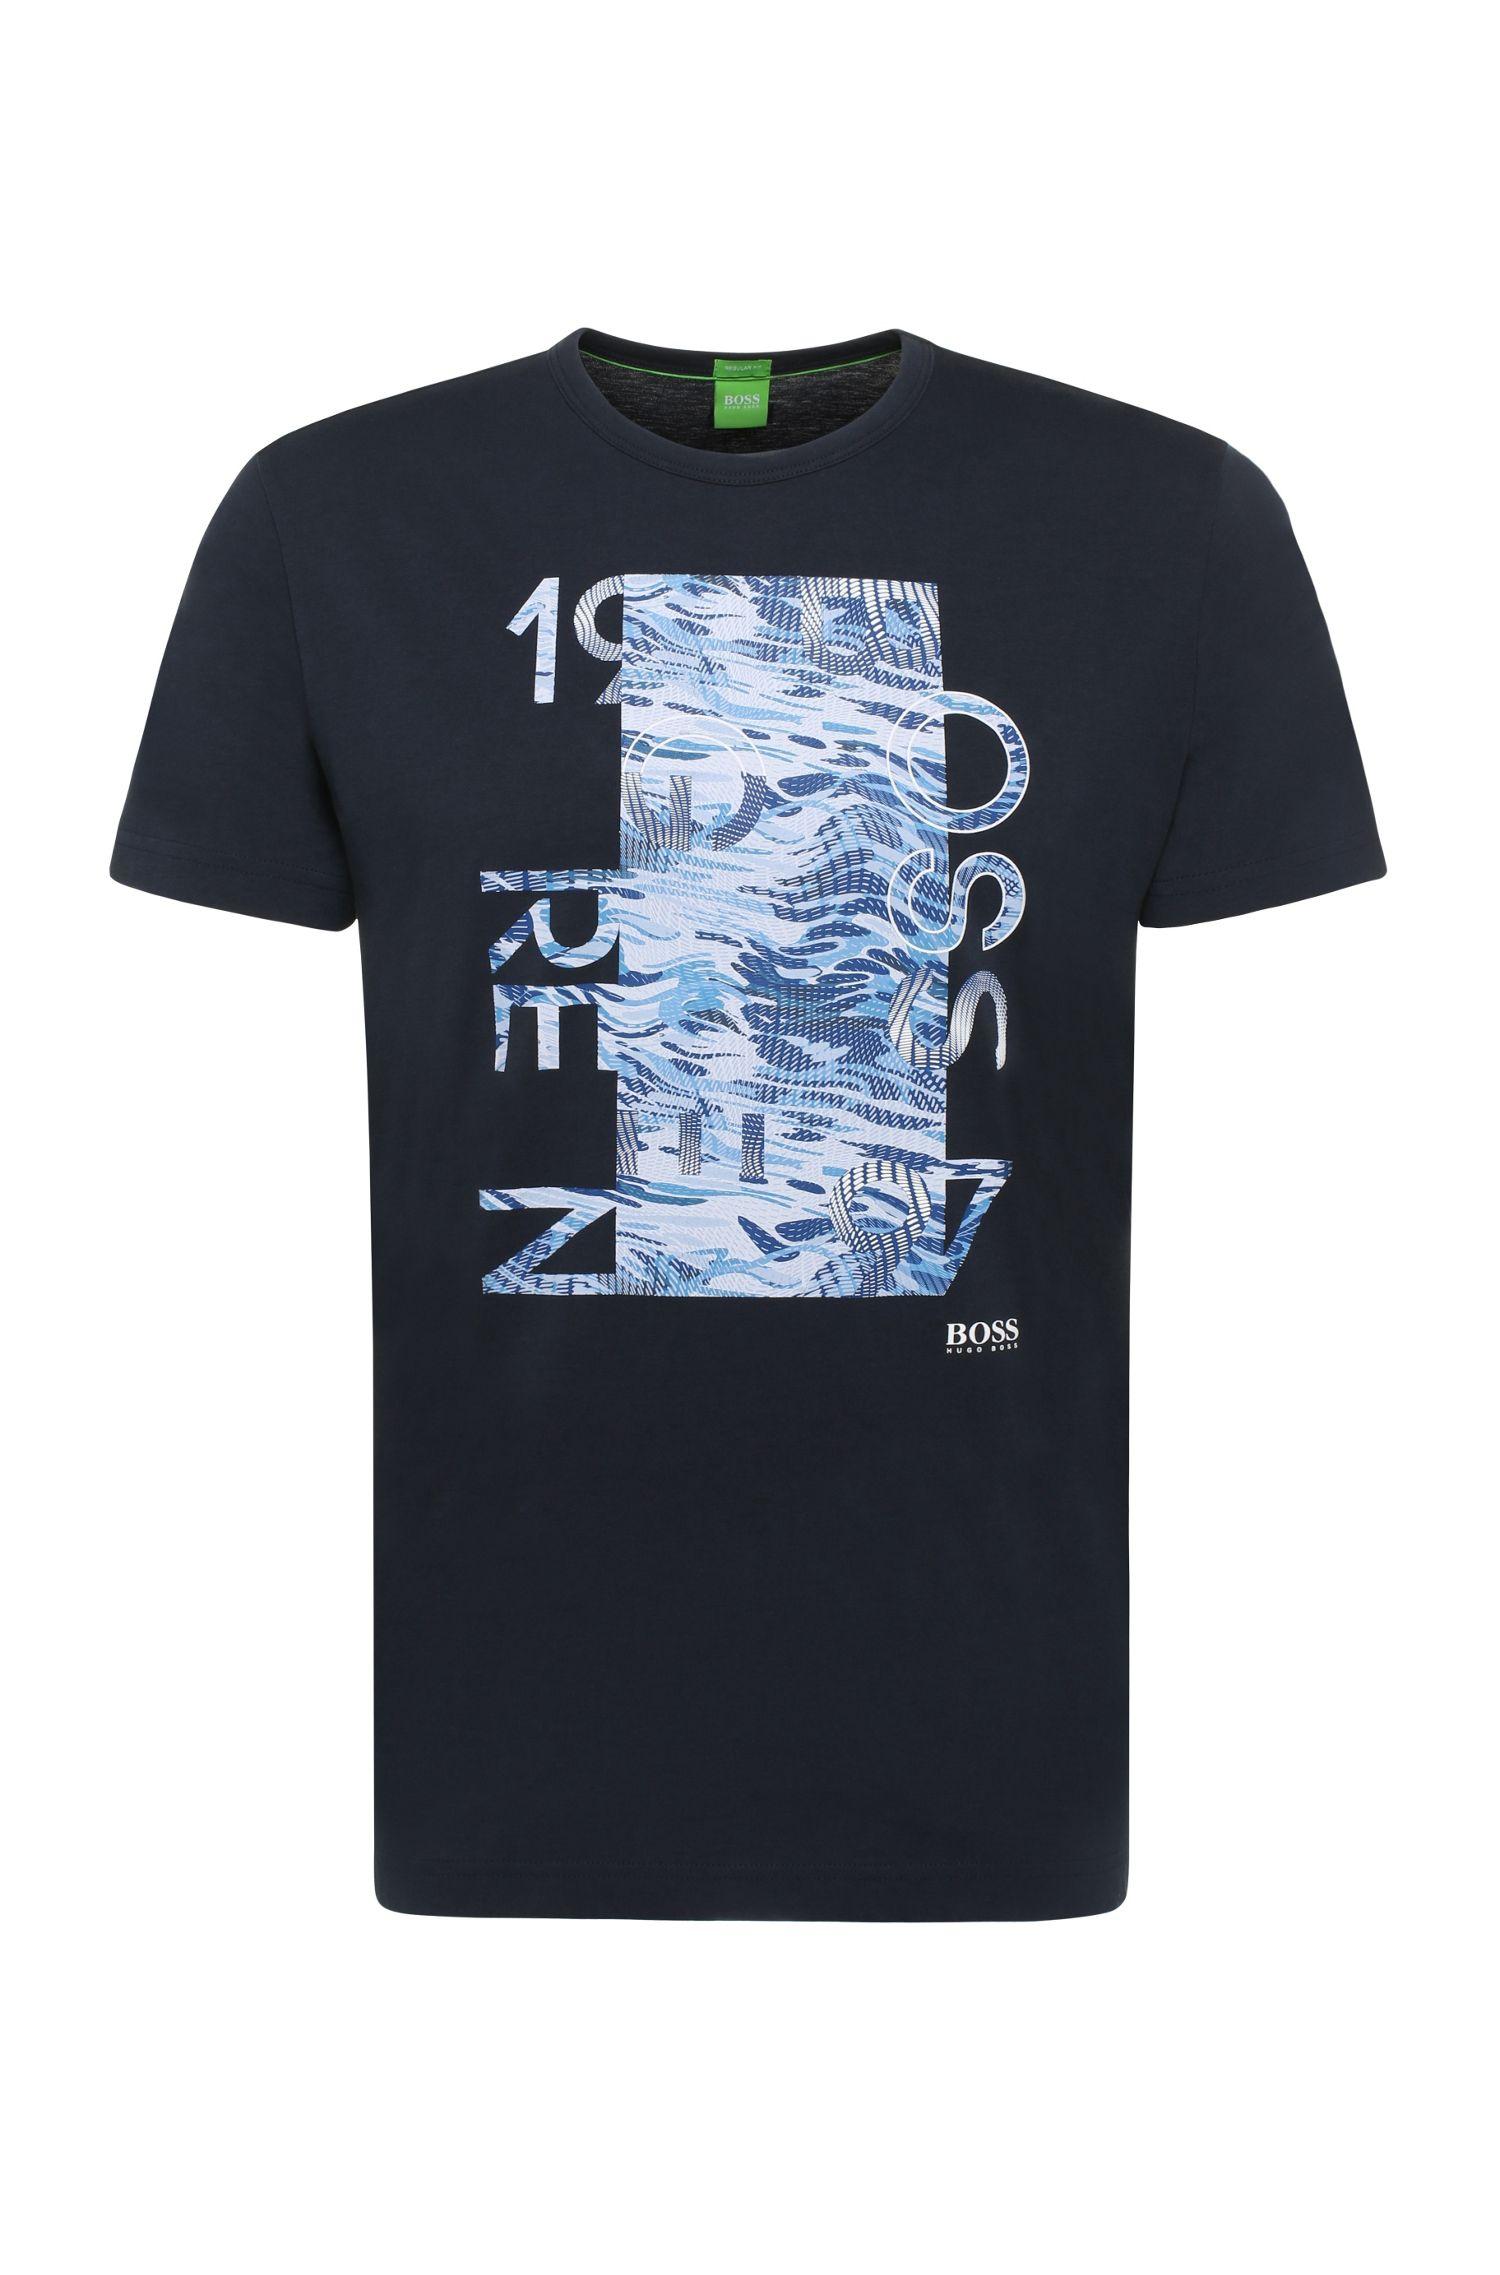 'Tee 4'   Cotton Graphic Print T-Shirt